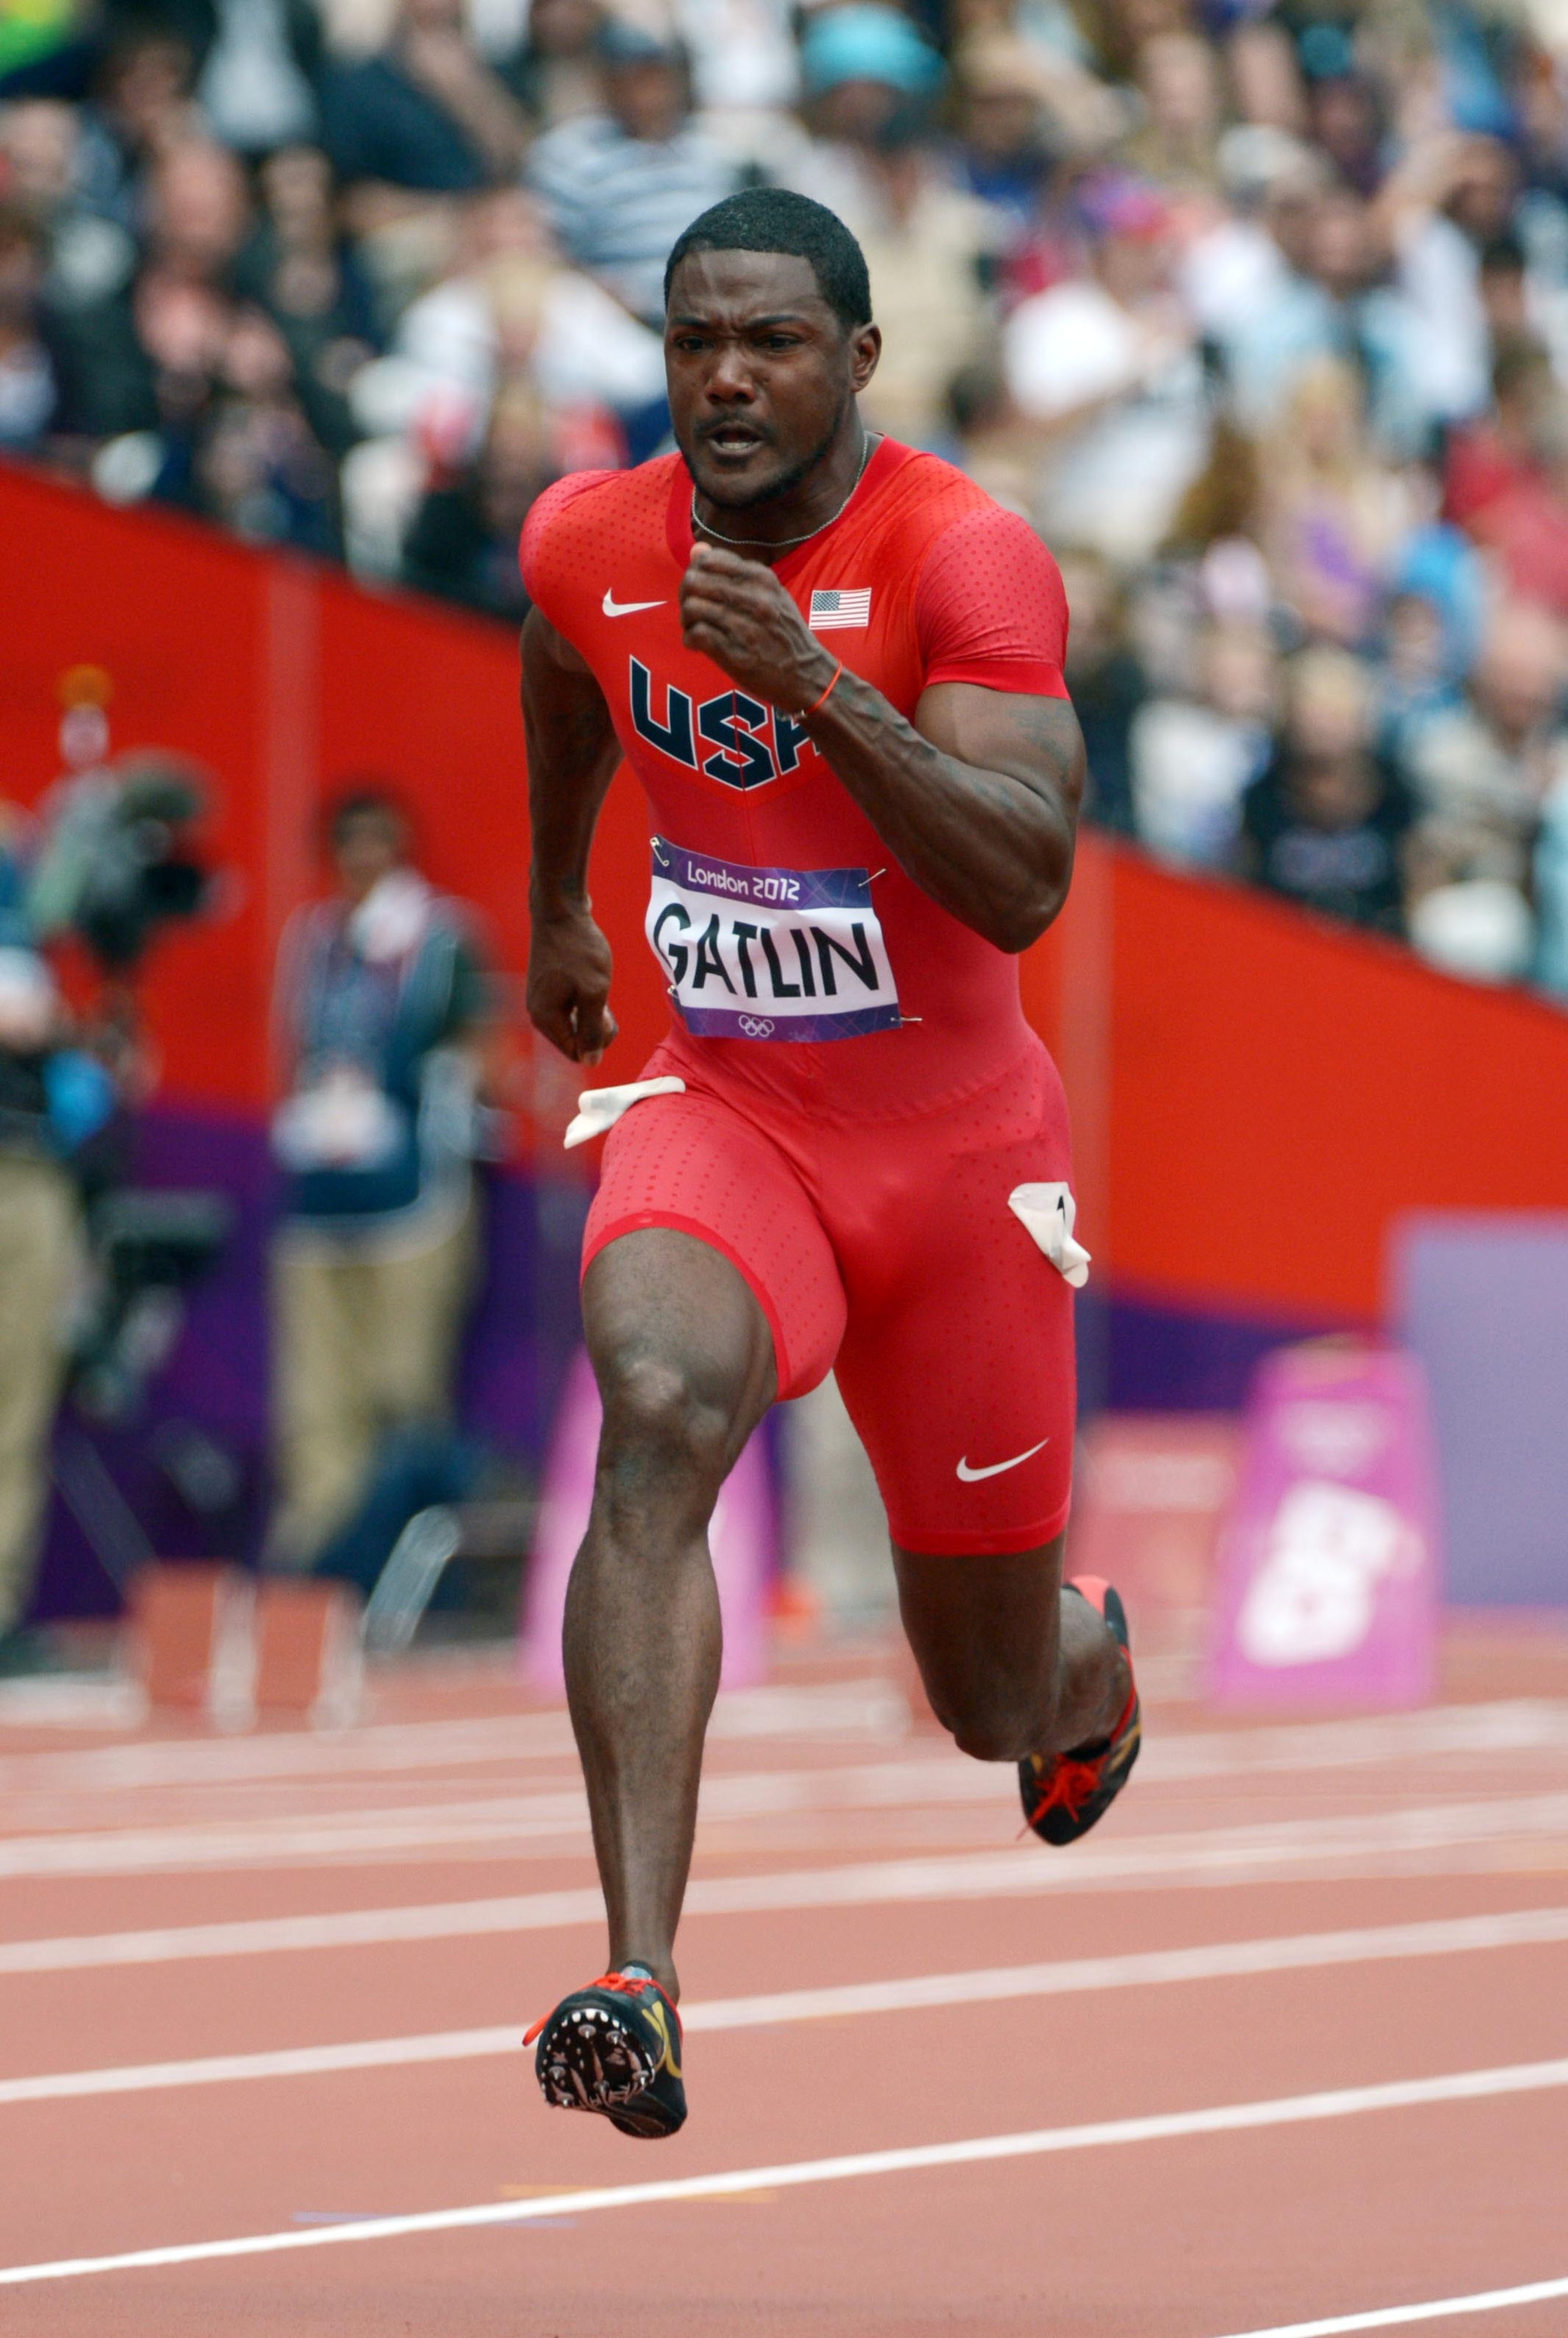 Tennessee' Justin Gatlin (USA) won bronze in the men's 100m.